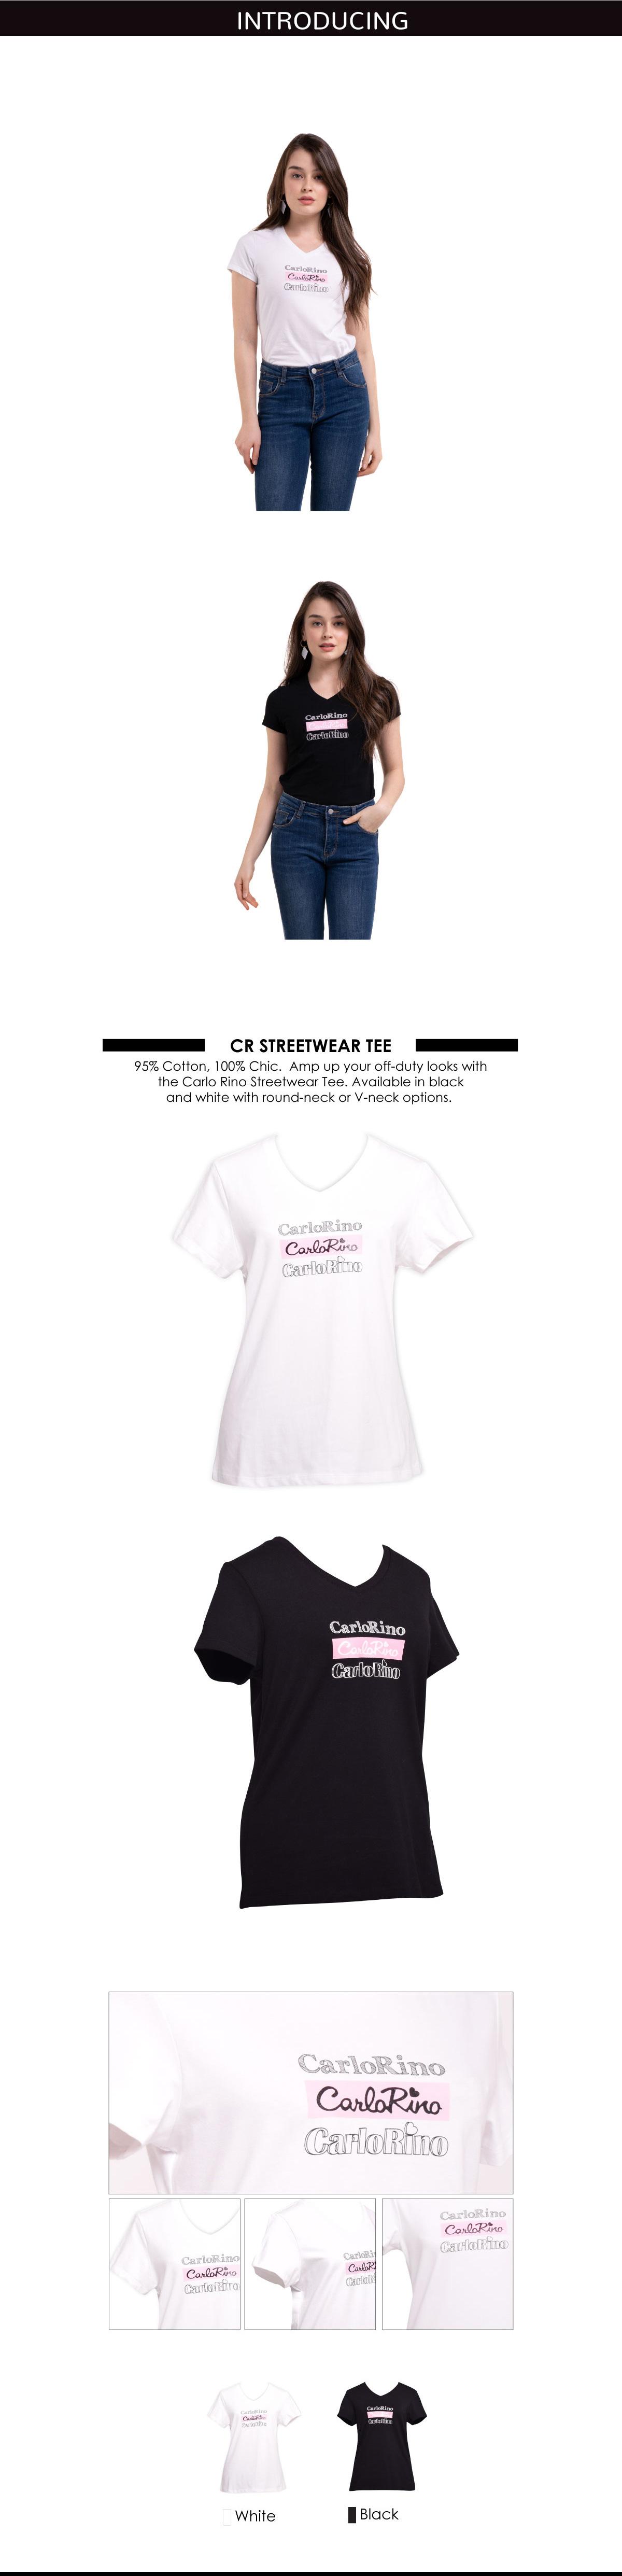 31T001 F001 - V-neck CR Print Tee